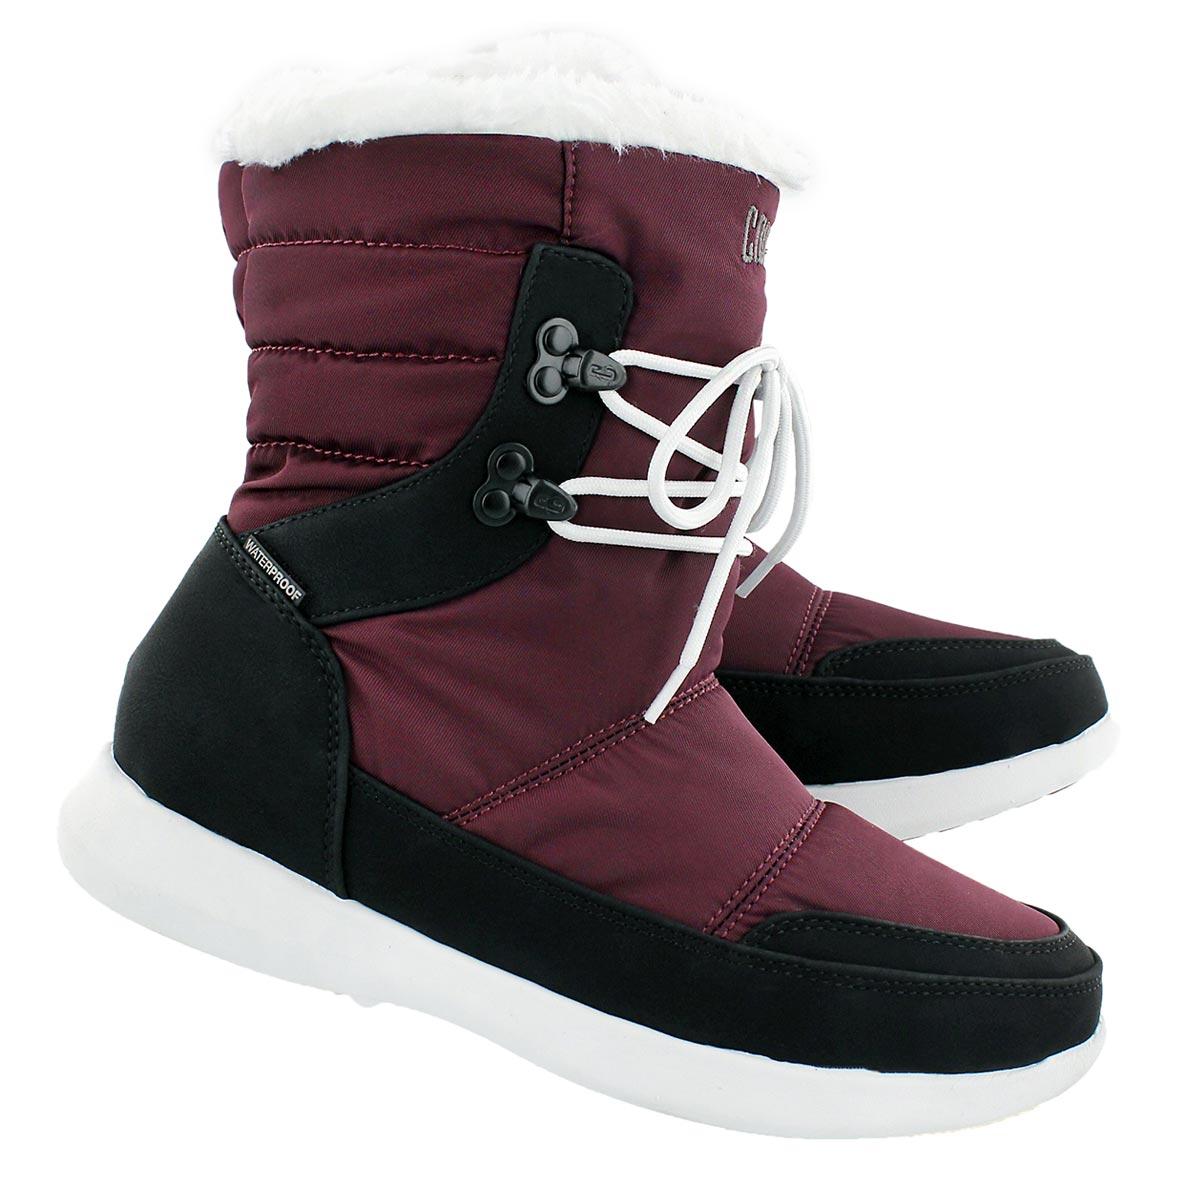 Lds Wonder bgdy wtpf pull on winter boot